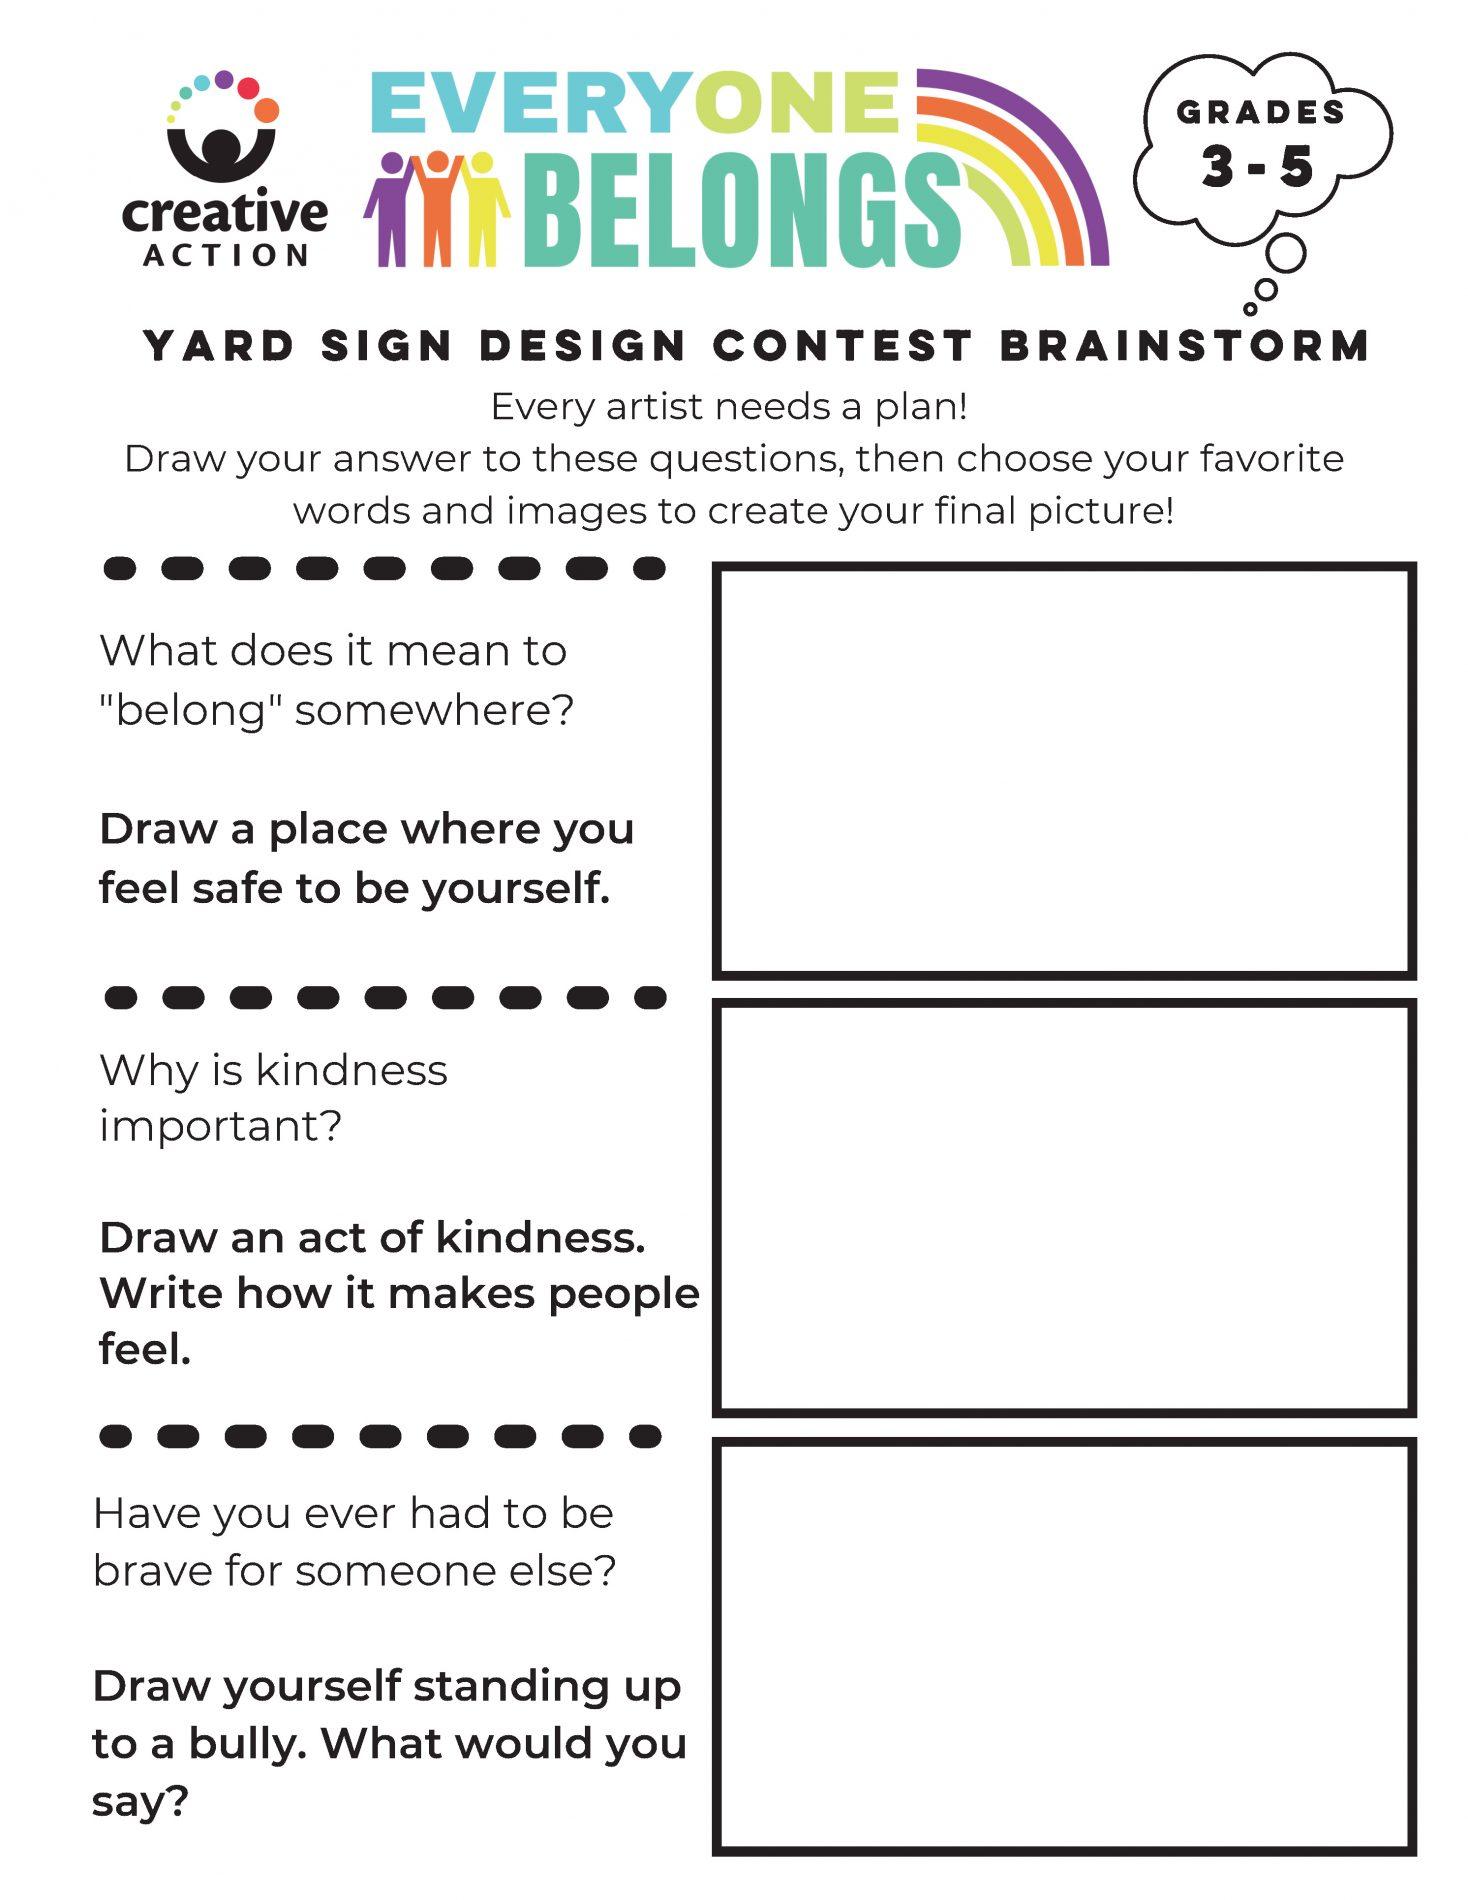 Brainstorm your yard sign worksheet for 3rd-5th grades